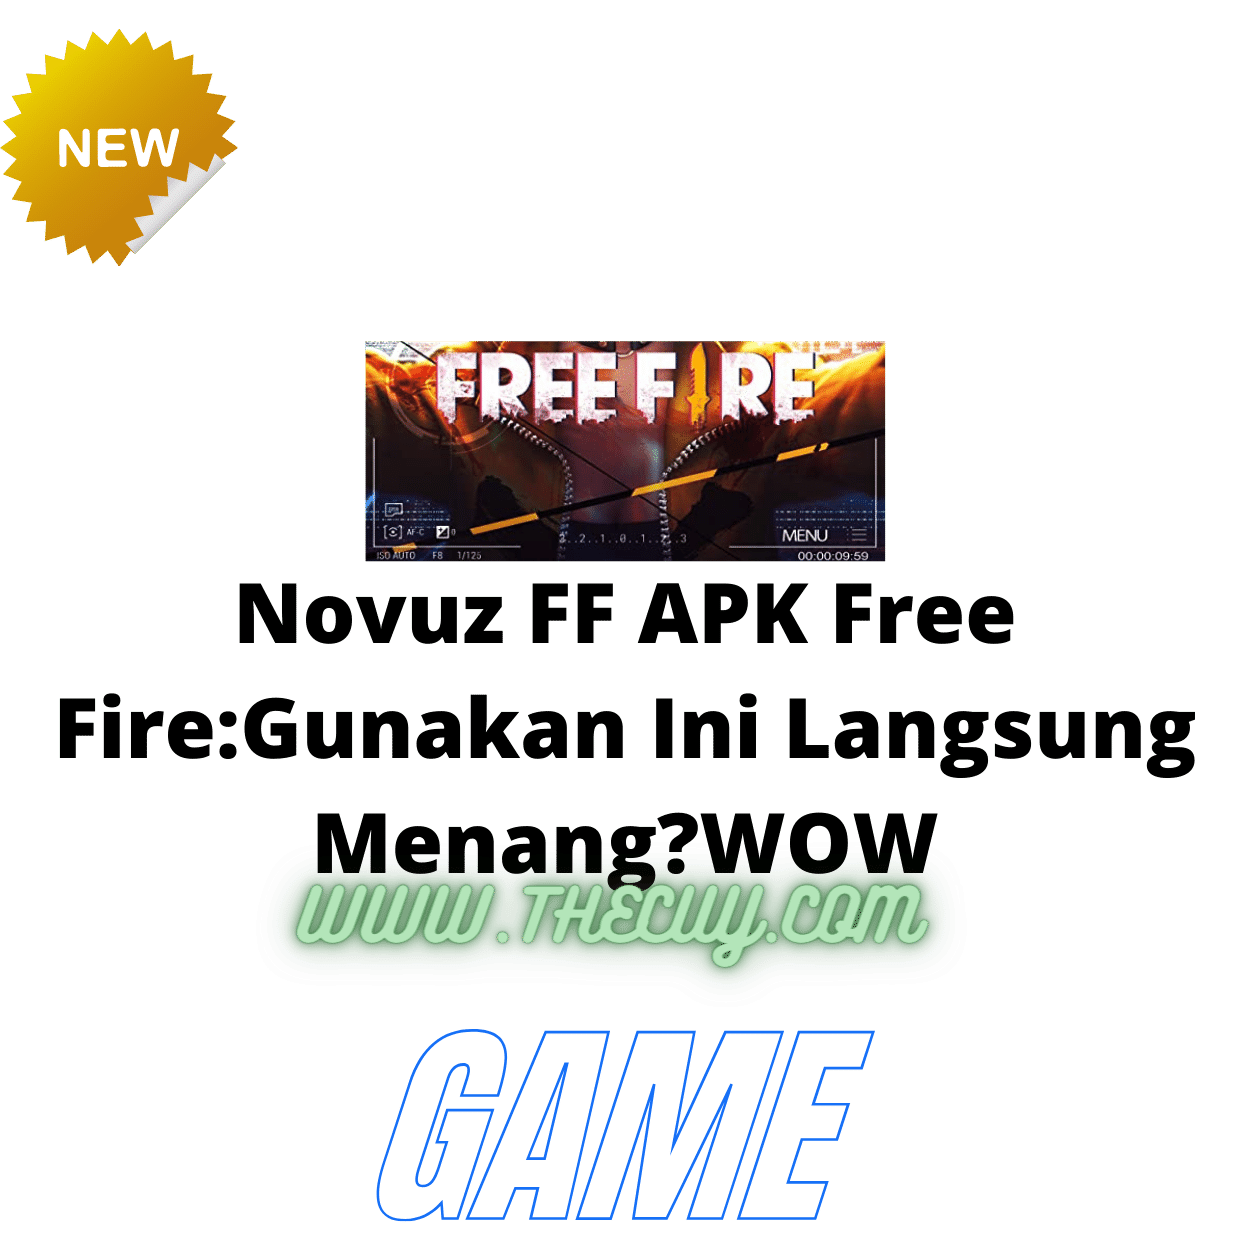 Novuz FF APK Free Fire:Gunakan Ini Langsung Menang?WOW